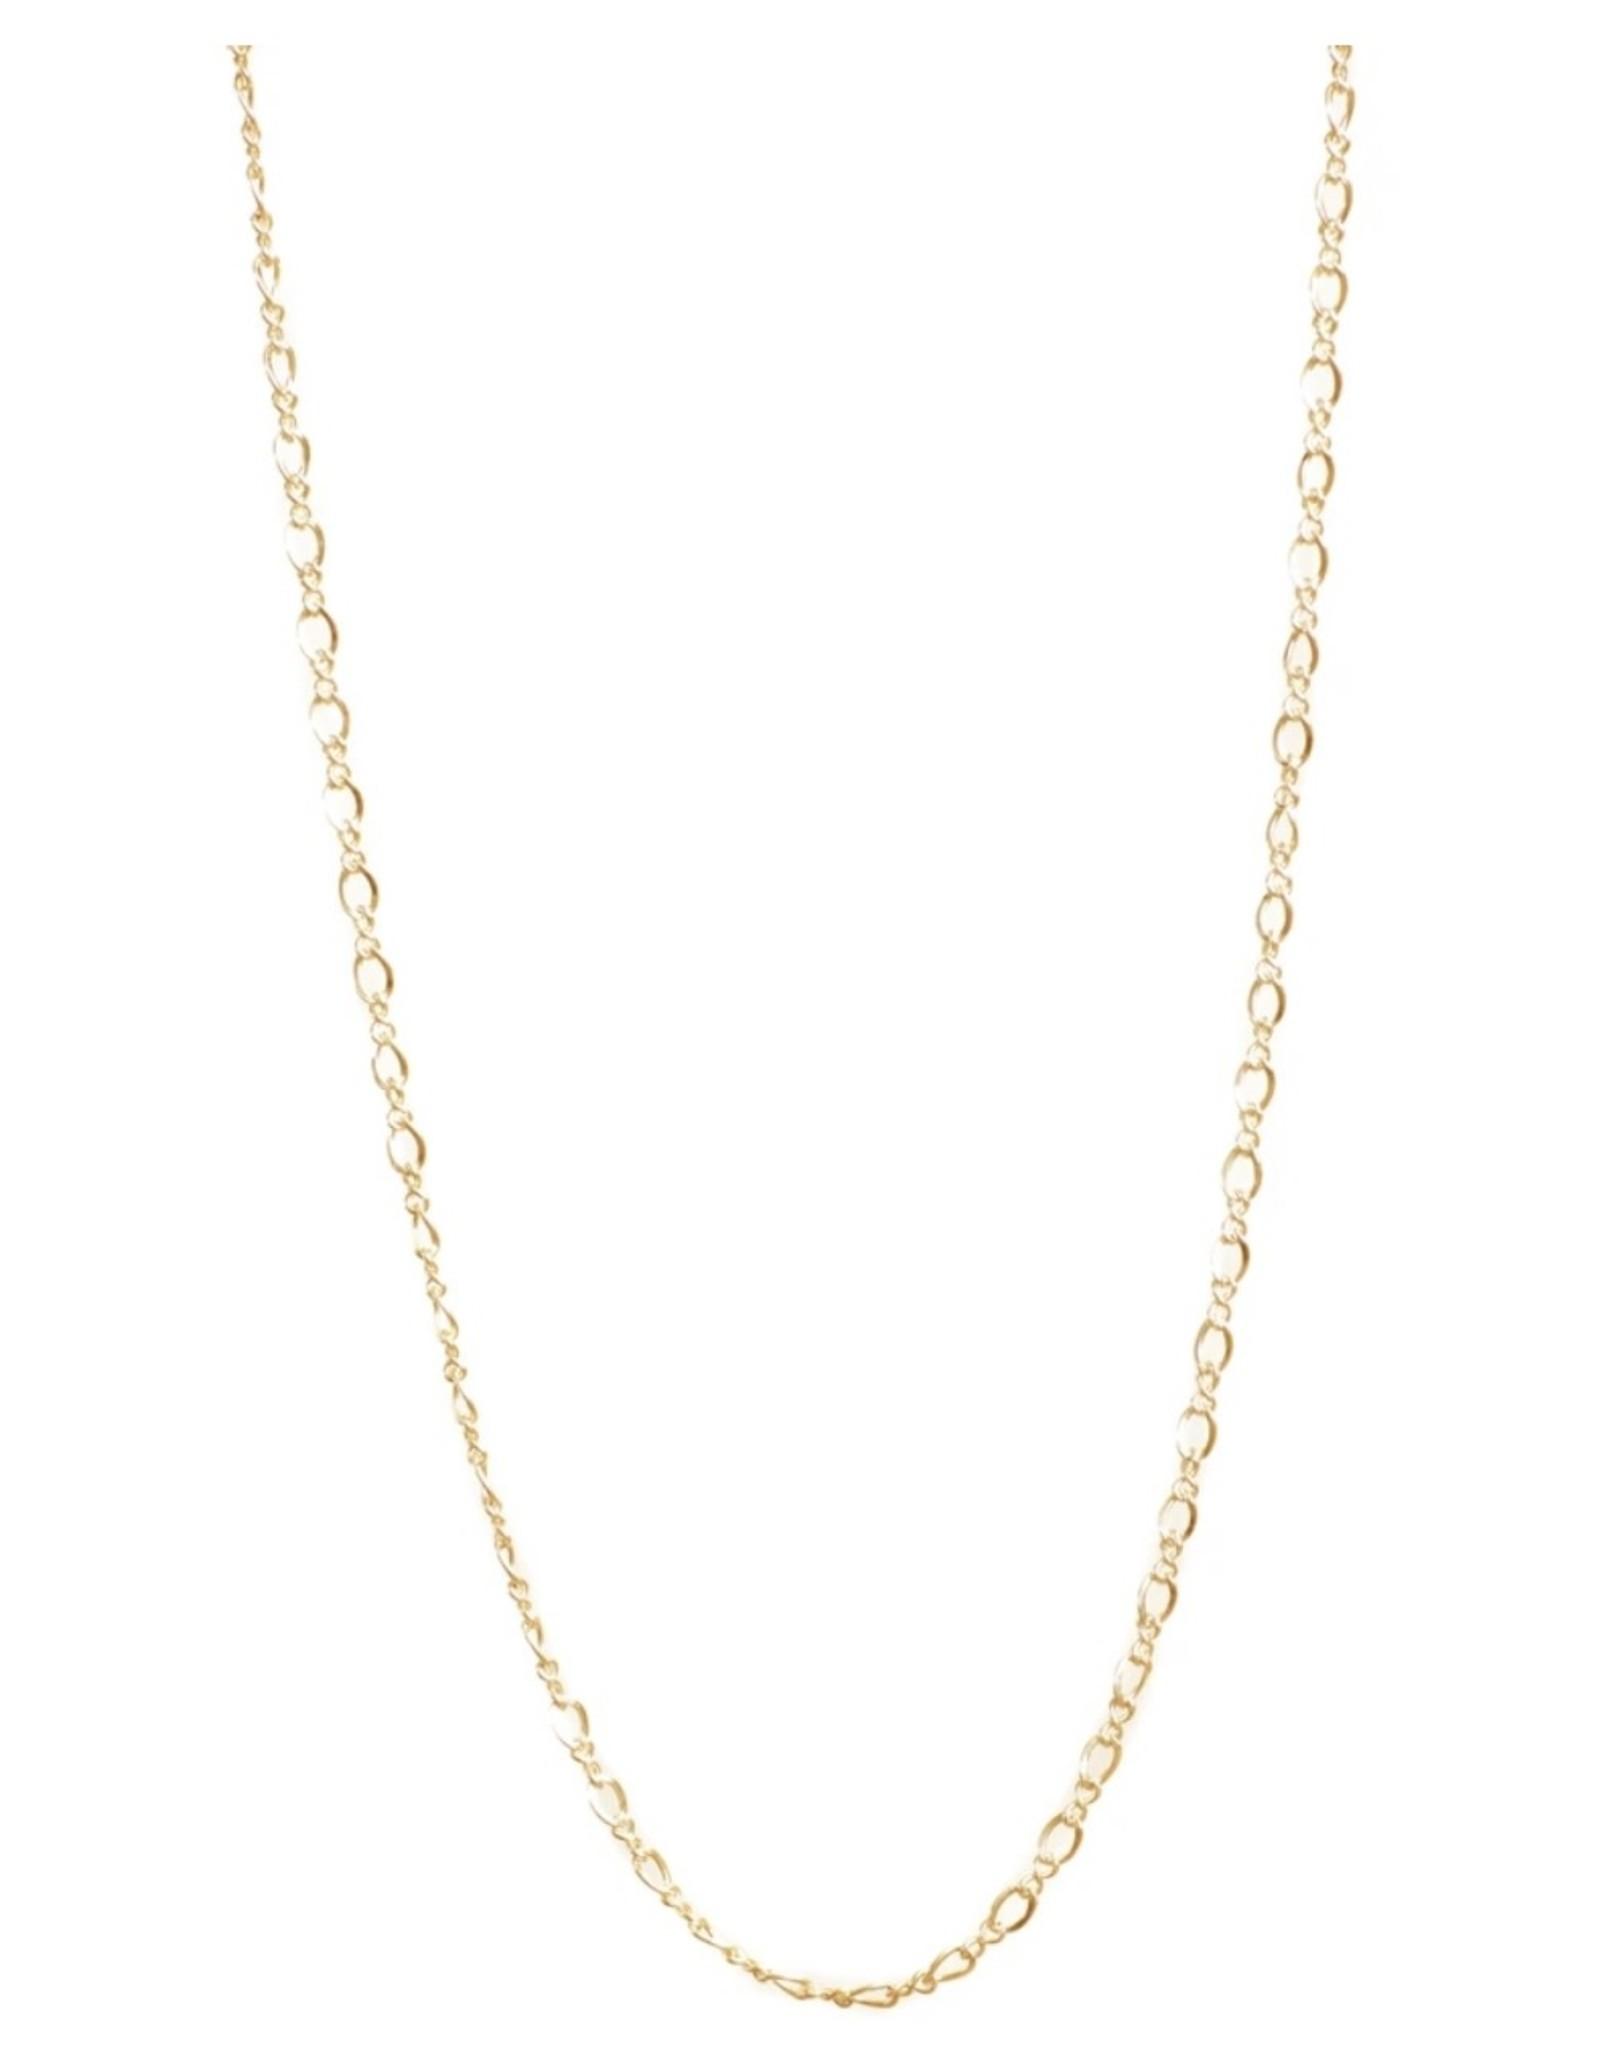 Lisbeth Daisy Chain, 14K Gold Filled